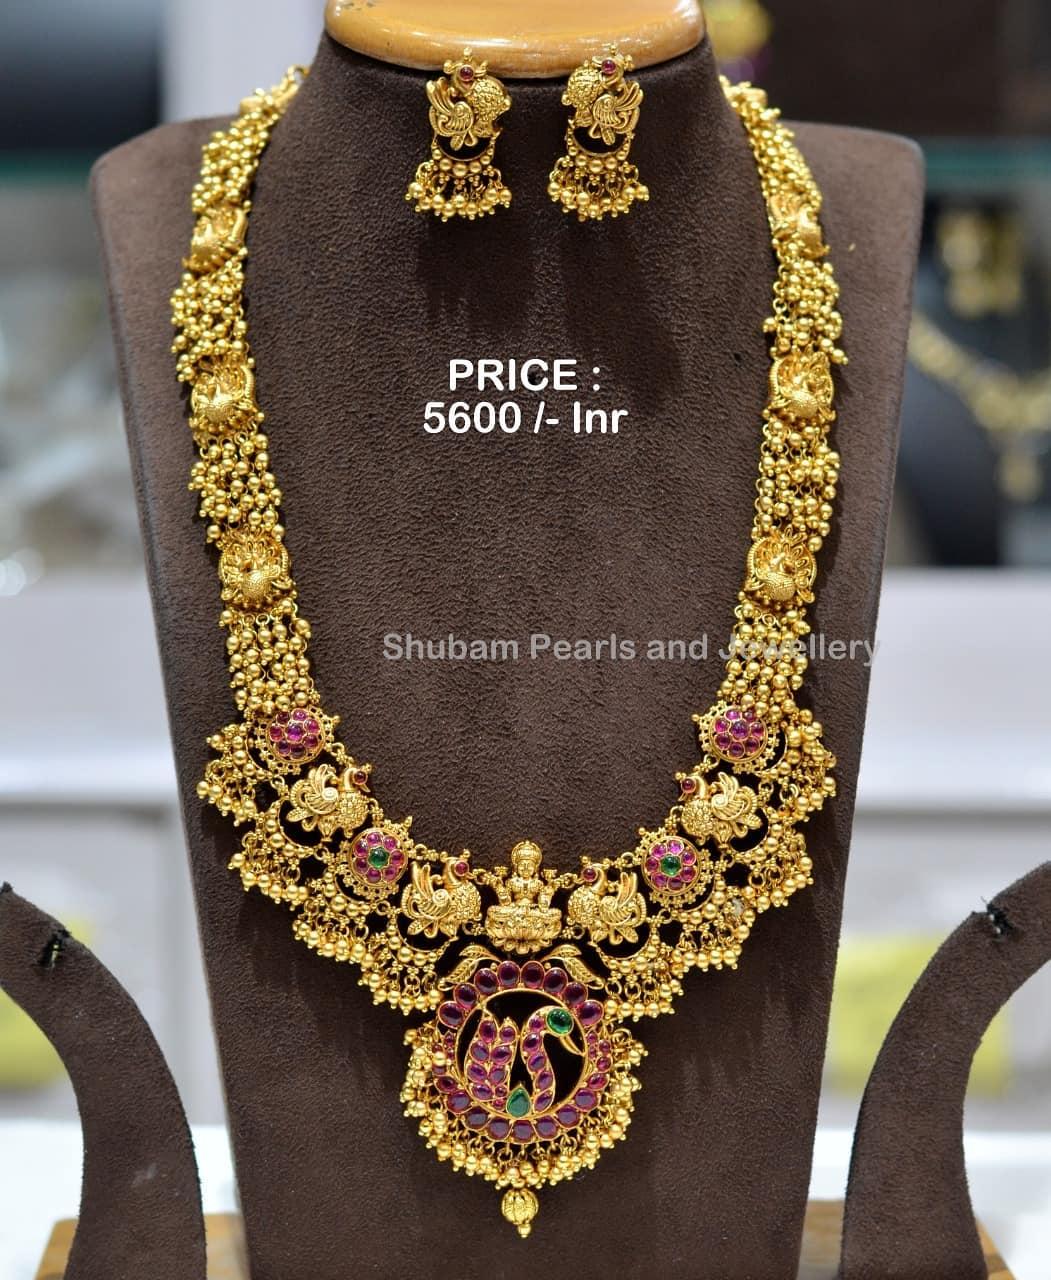 Beautiful one gram gold temple Laksjmi long haaram with muvvalu hangings.  Price : 5600/- one gram gold long chain designs 1 gram jewellery online one gram gold temple jewellery